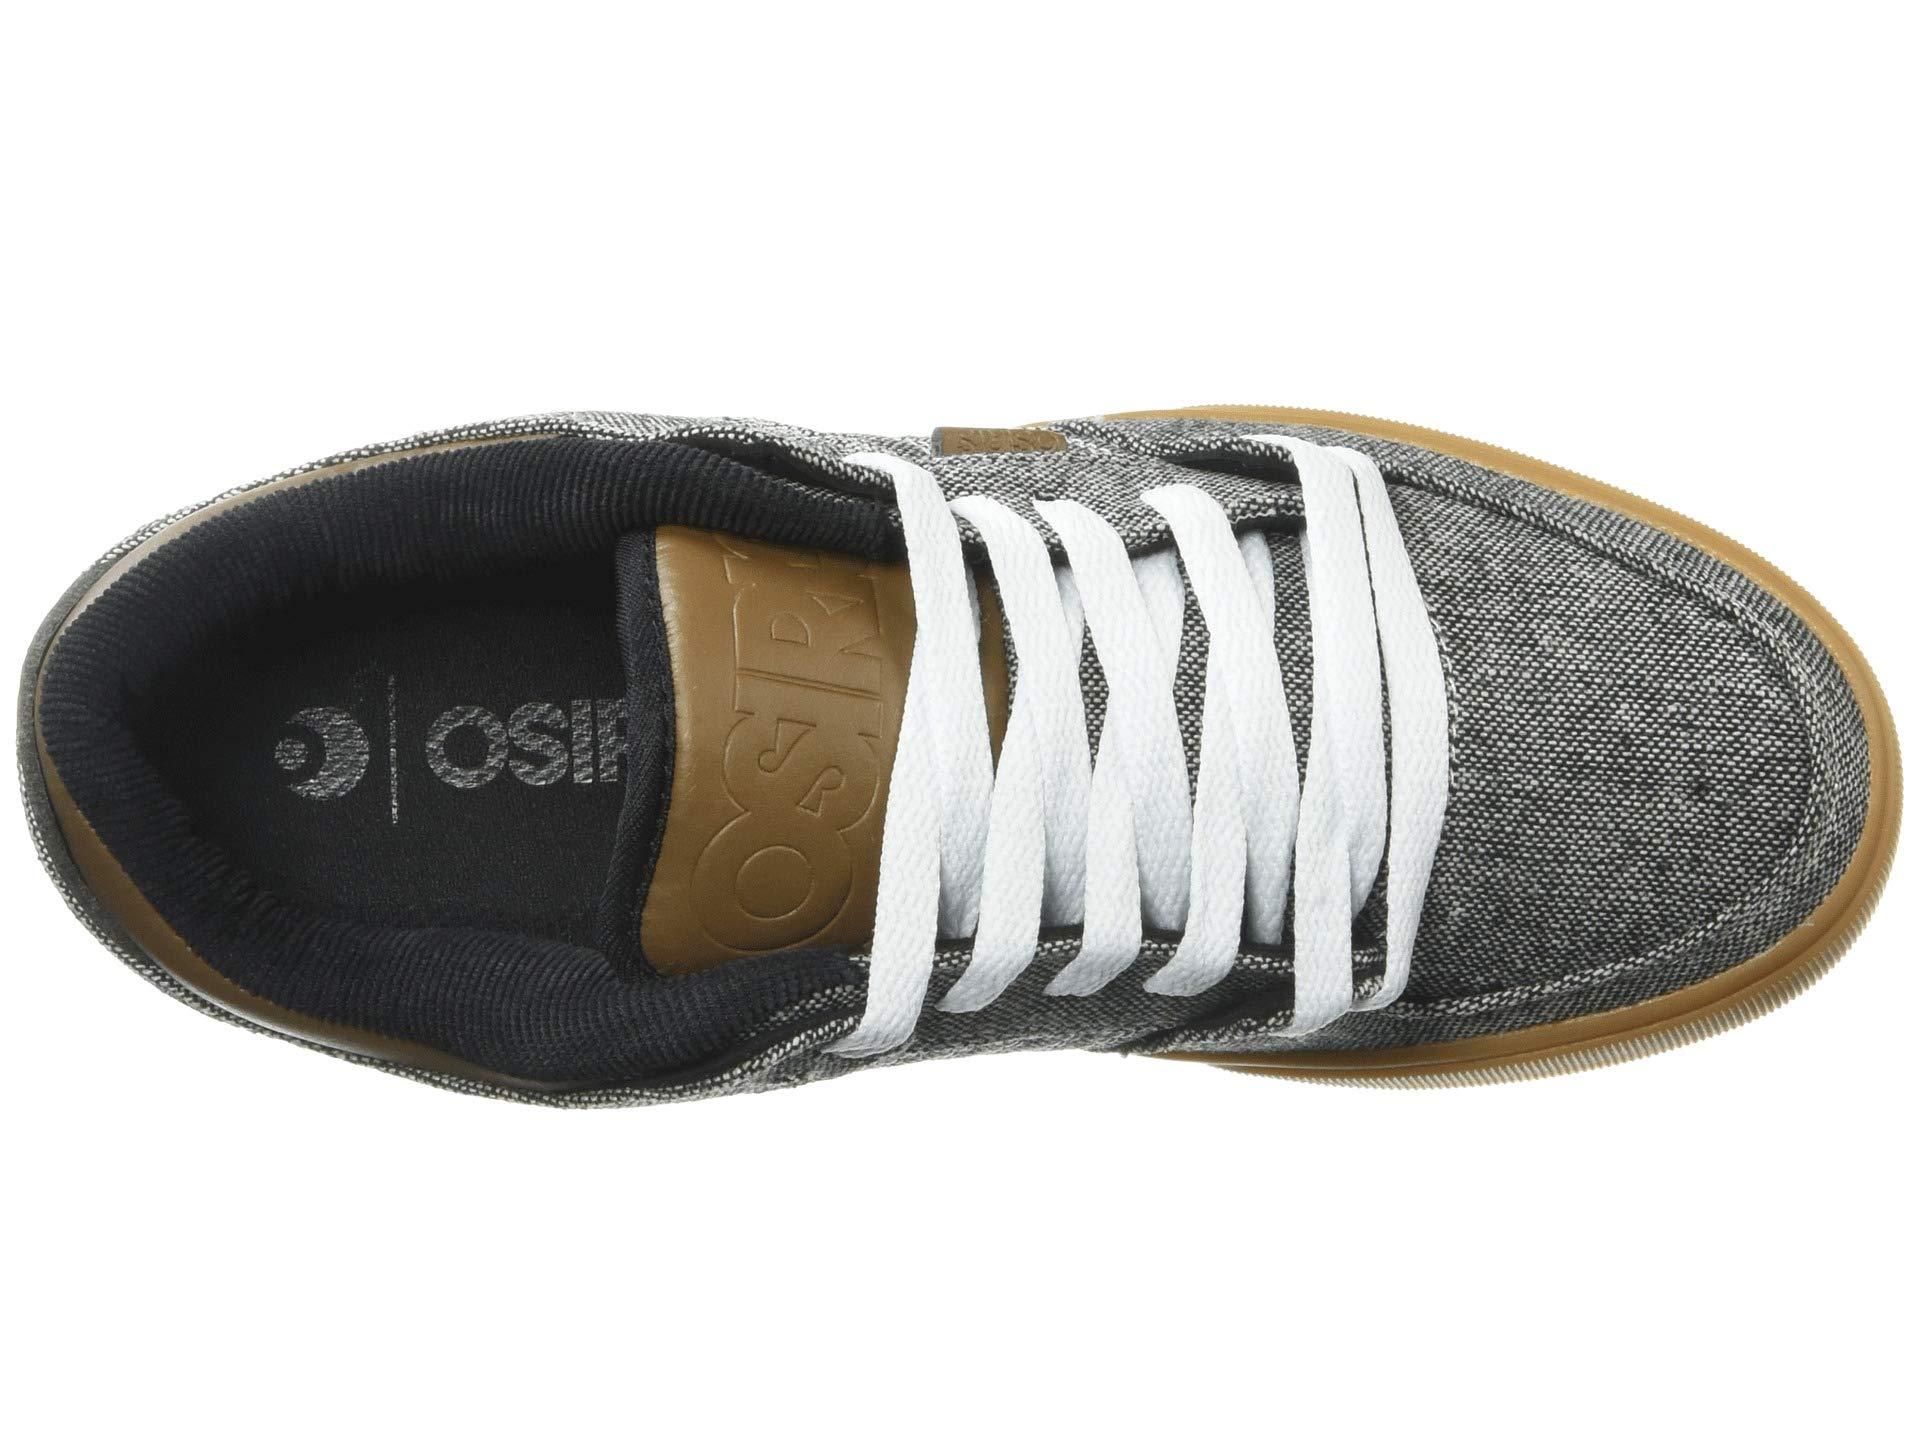 Osiris Protocol Charcoal Osiris Protocol Charcoal Protocol wool Osiris wool ZxwdqYUT6U